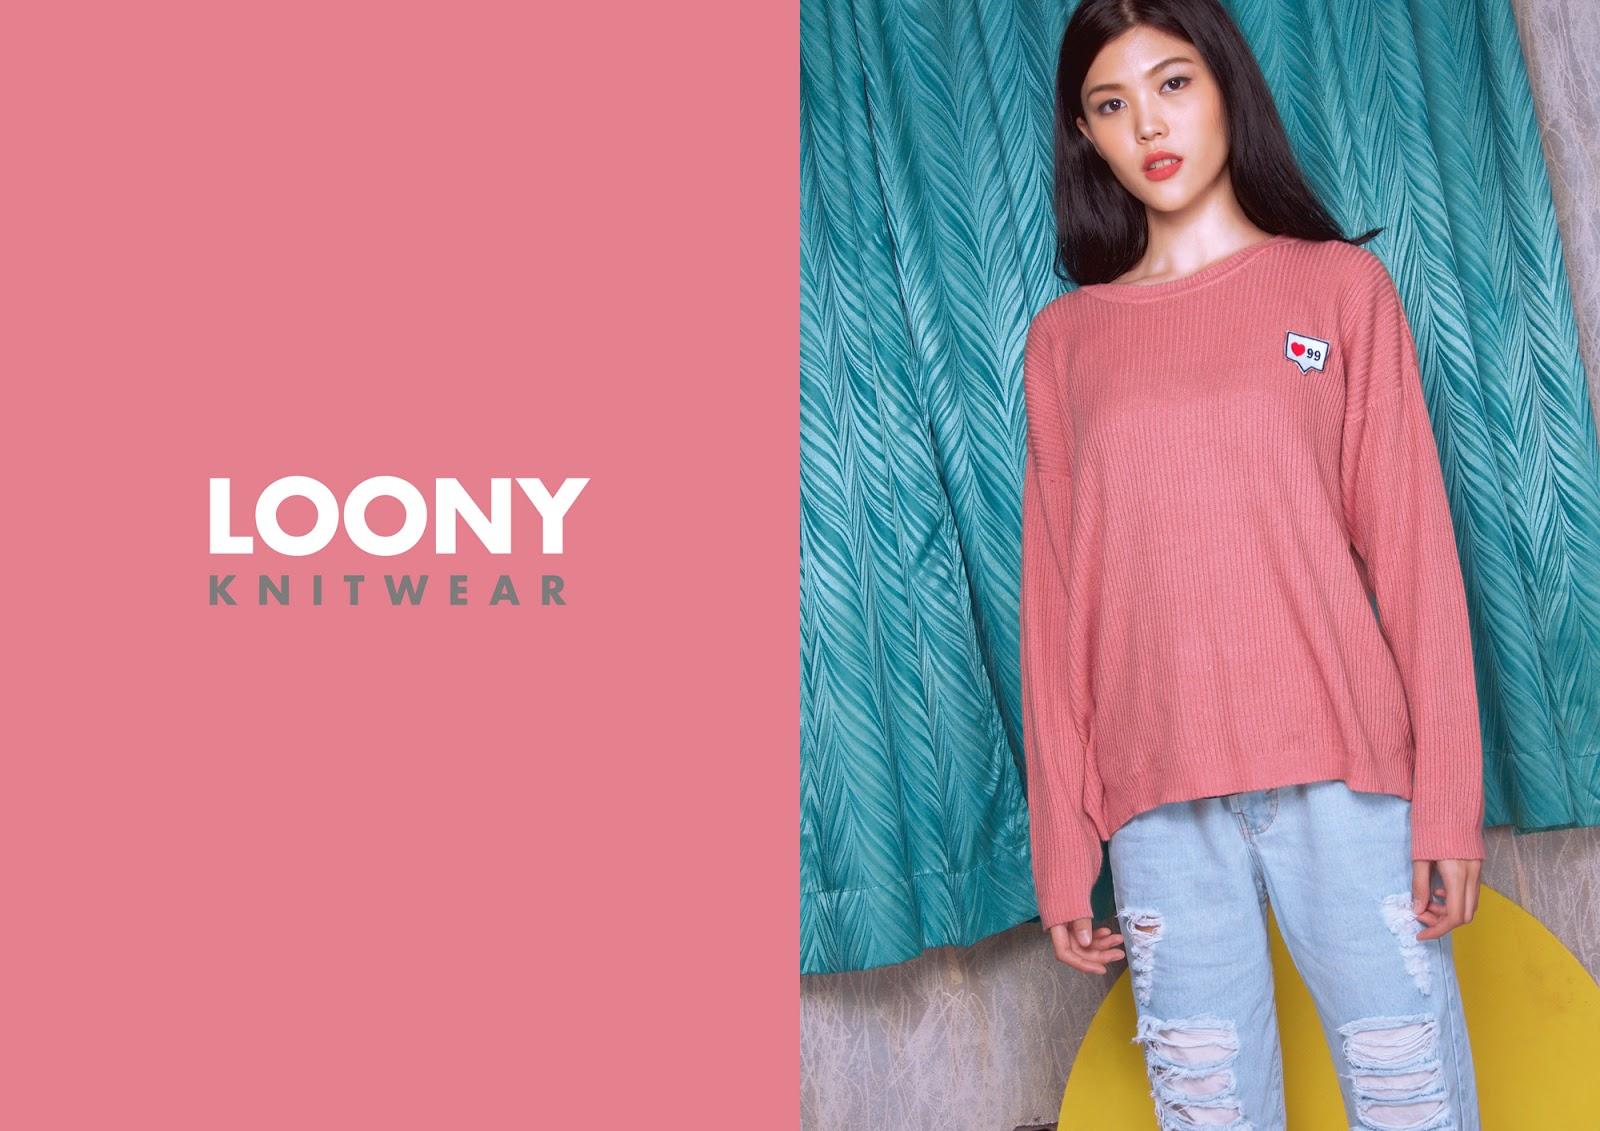 colorful photography fashion campaign korean pink yellow green haqi cahya haqeeu judith a team loony